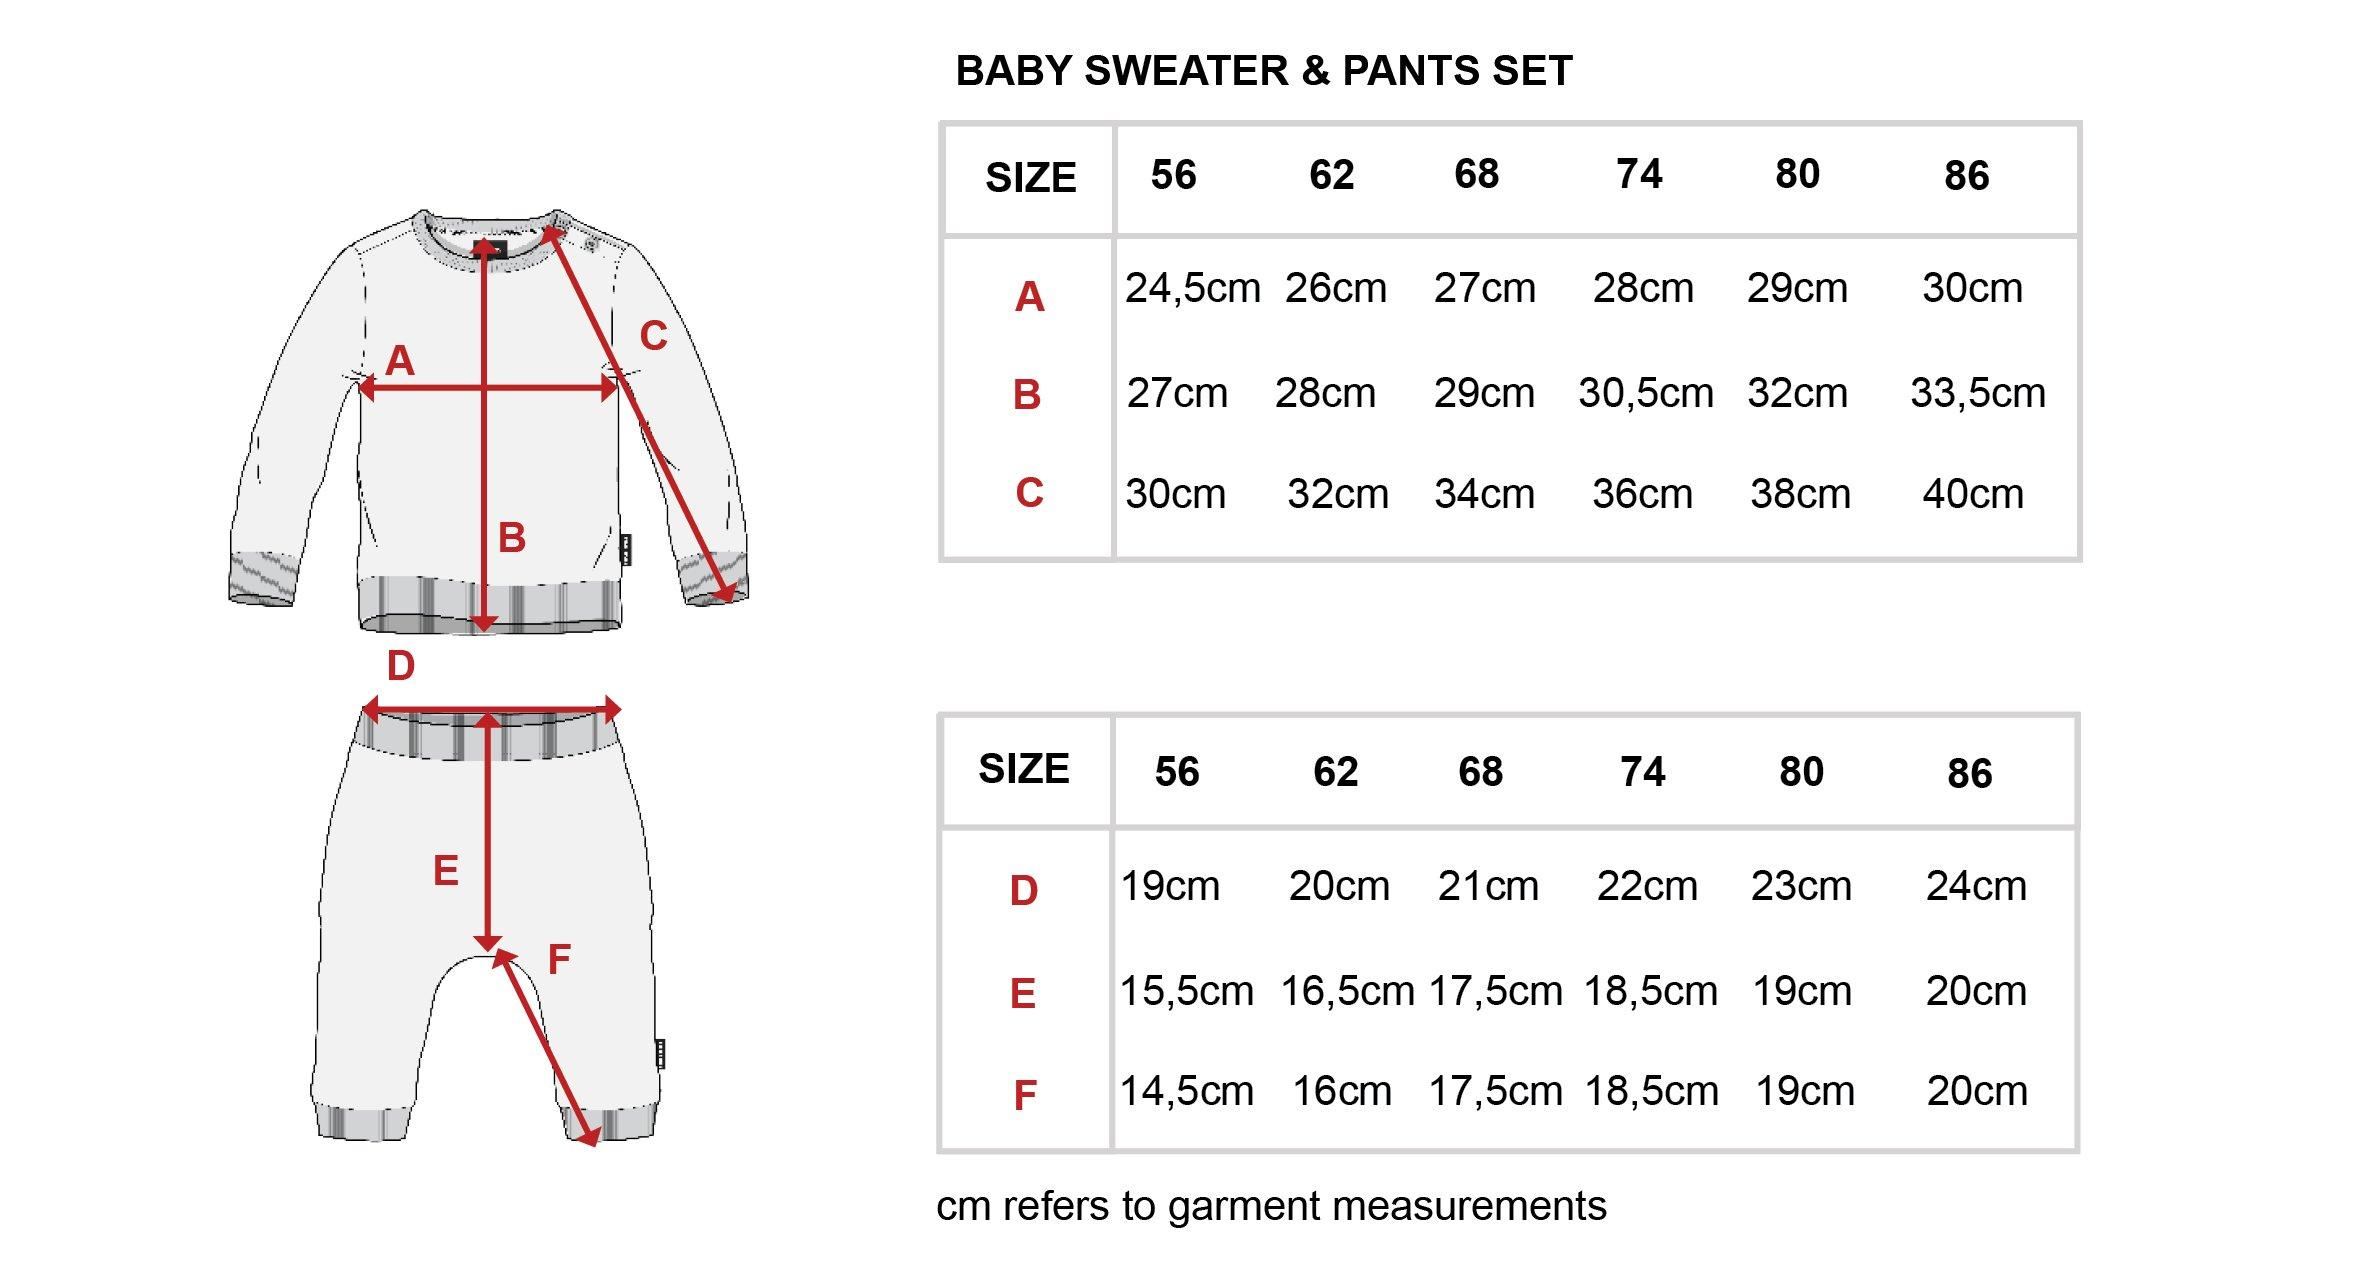 FW20-Baby-Sweater-Pants-Set